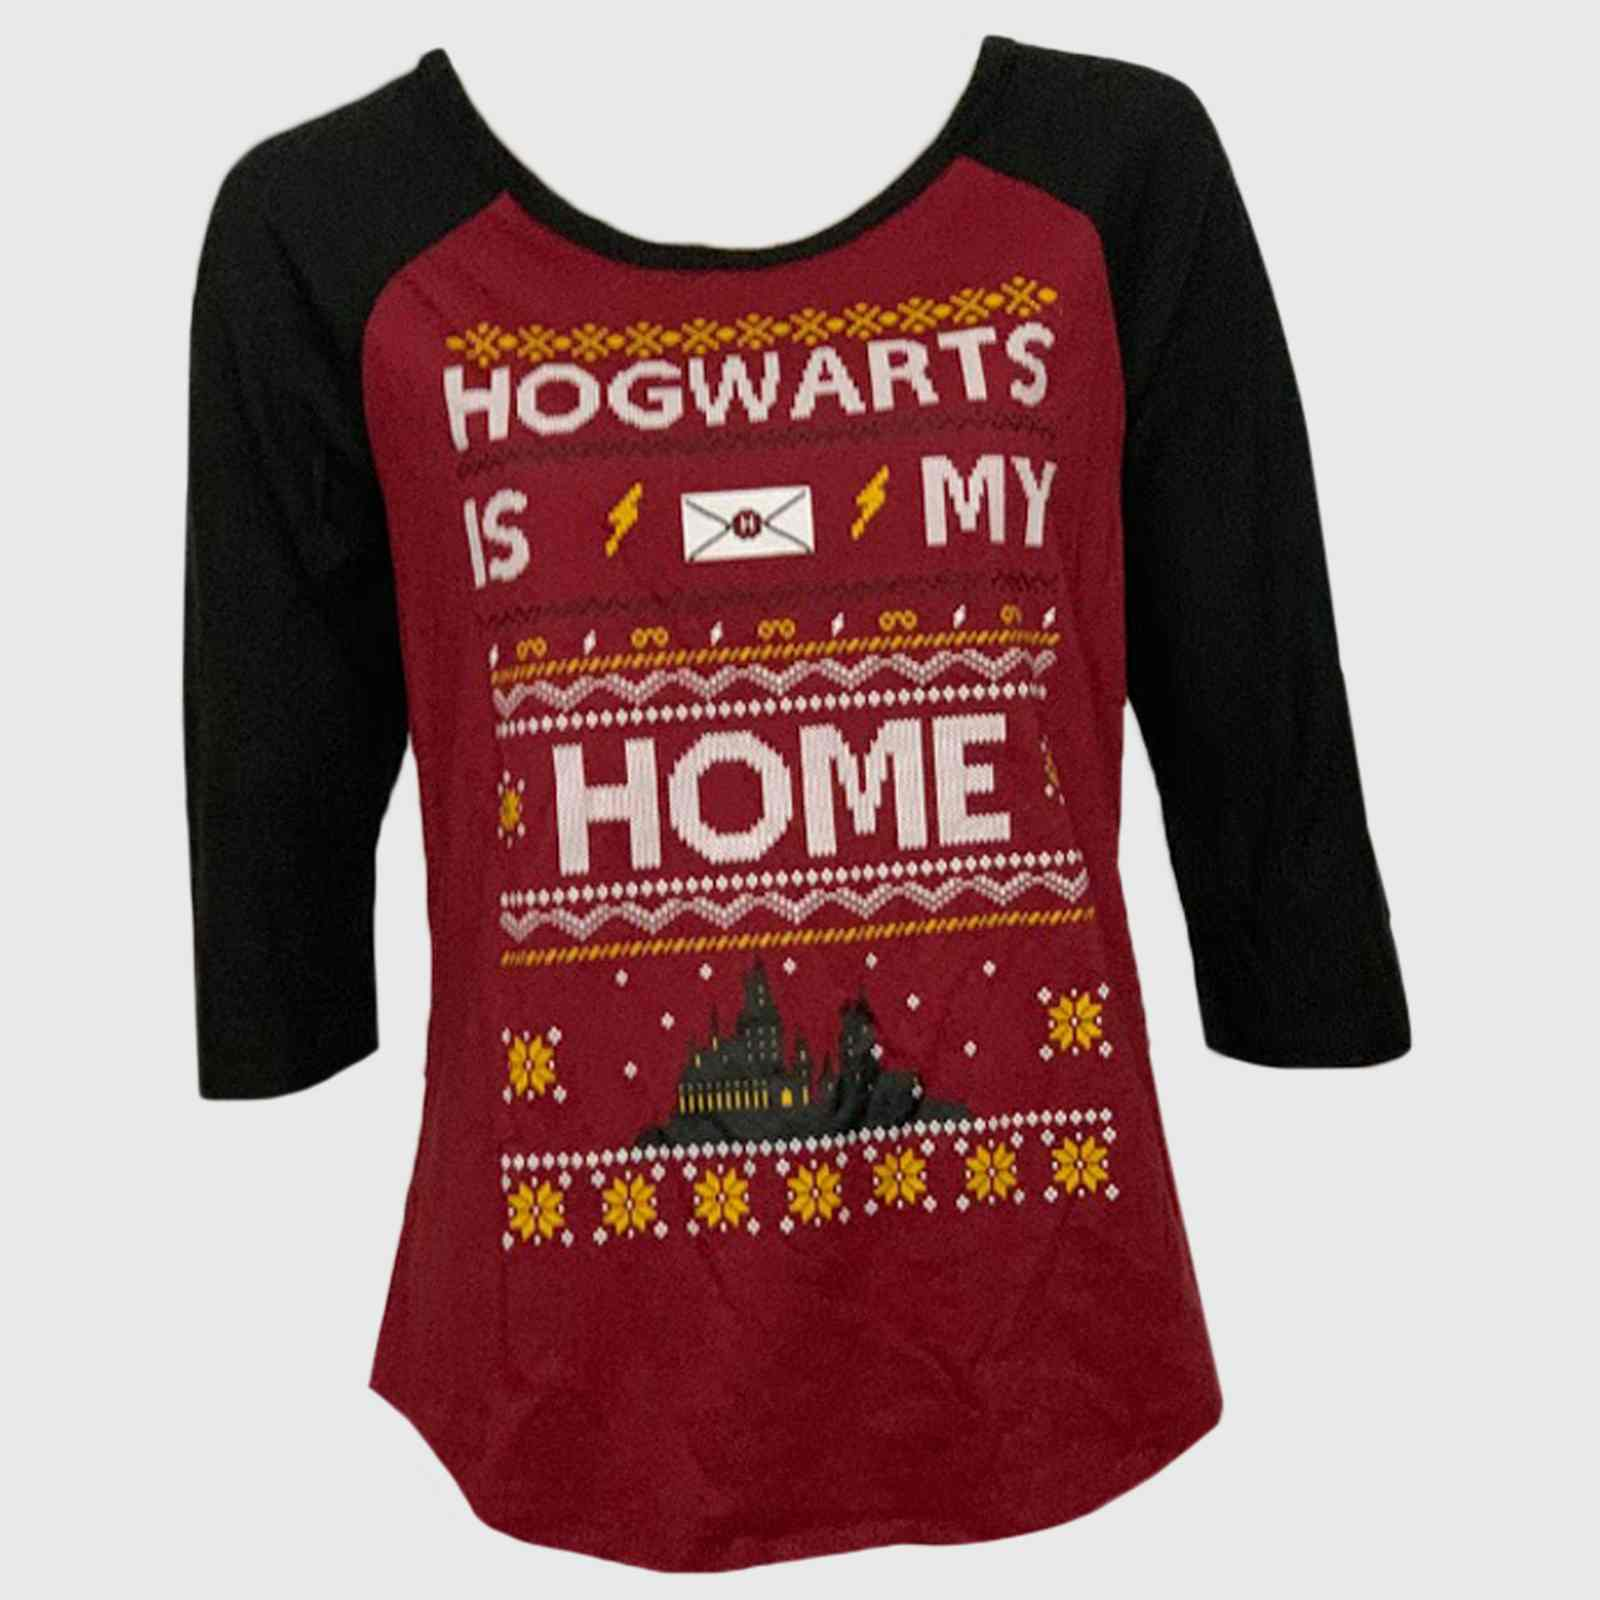 Весёлая женская кофточка Hogwarts is my home